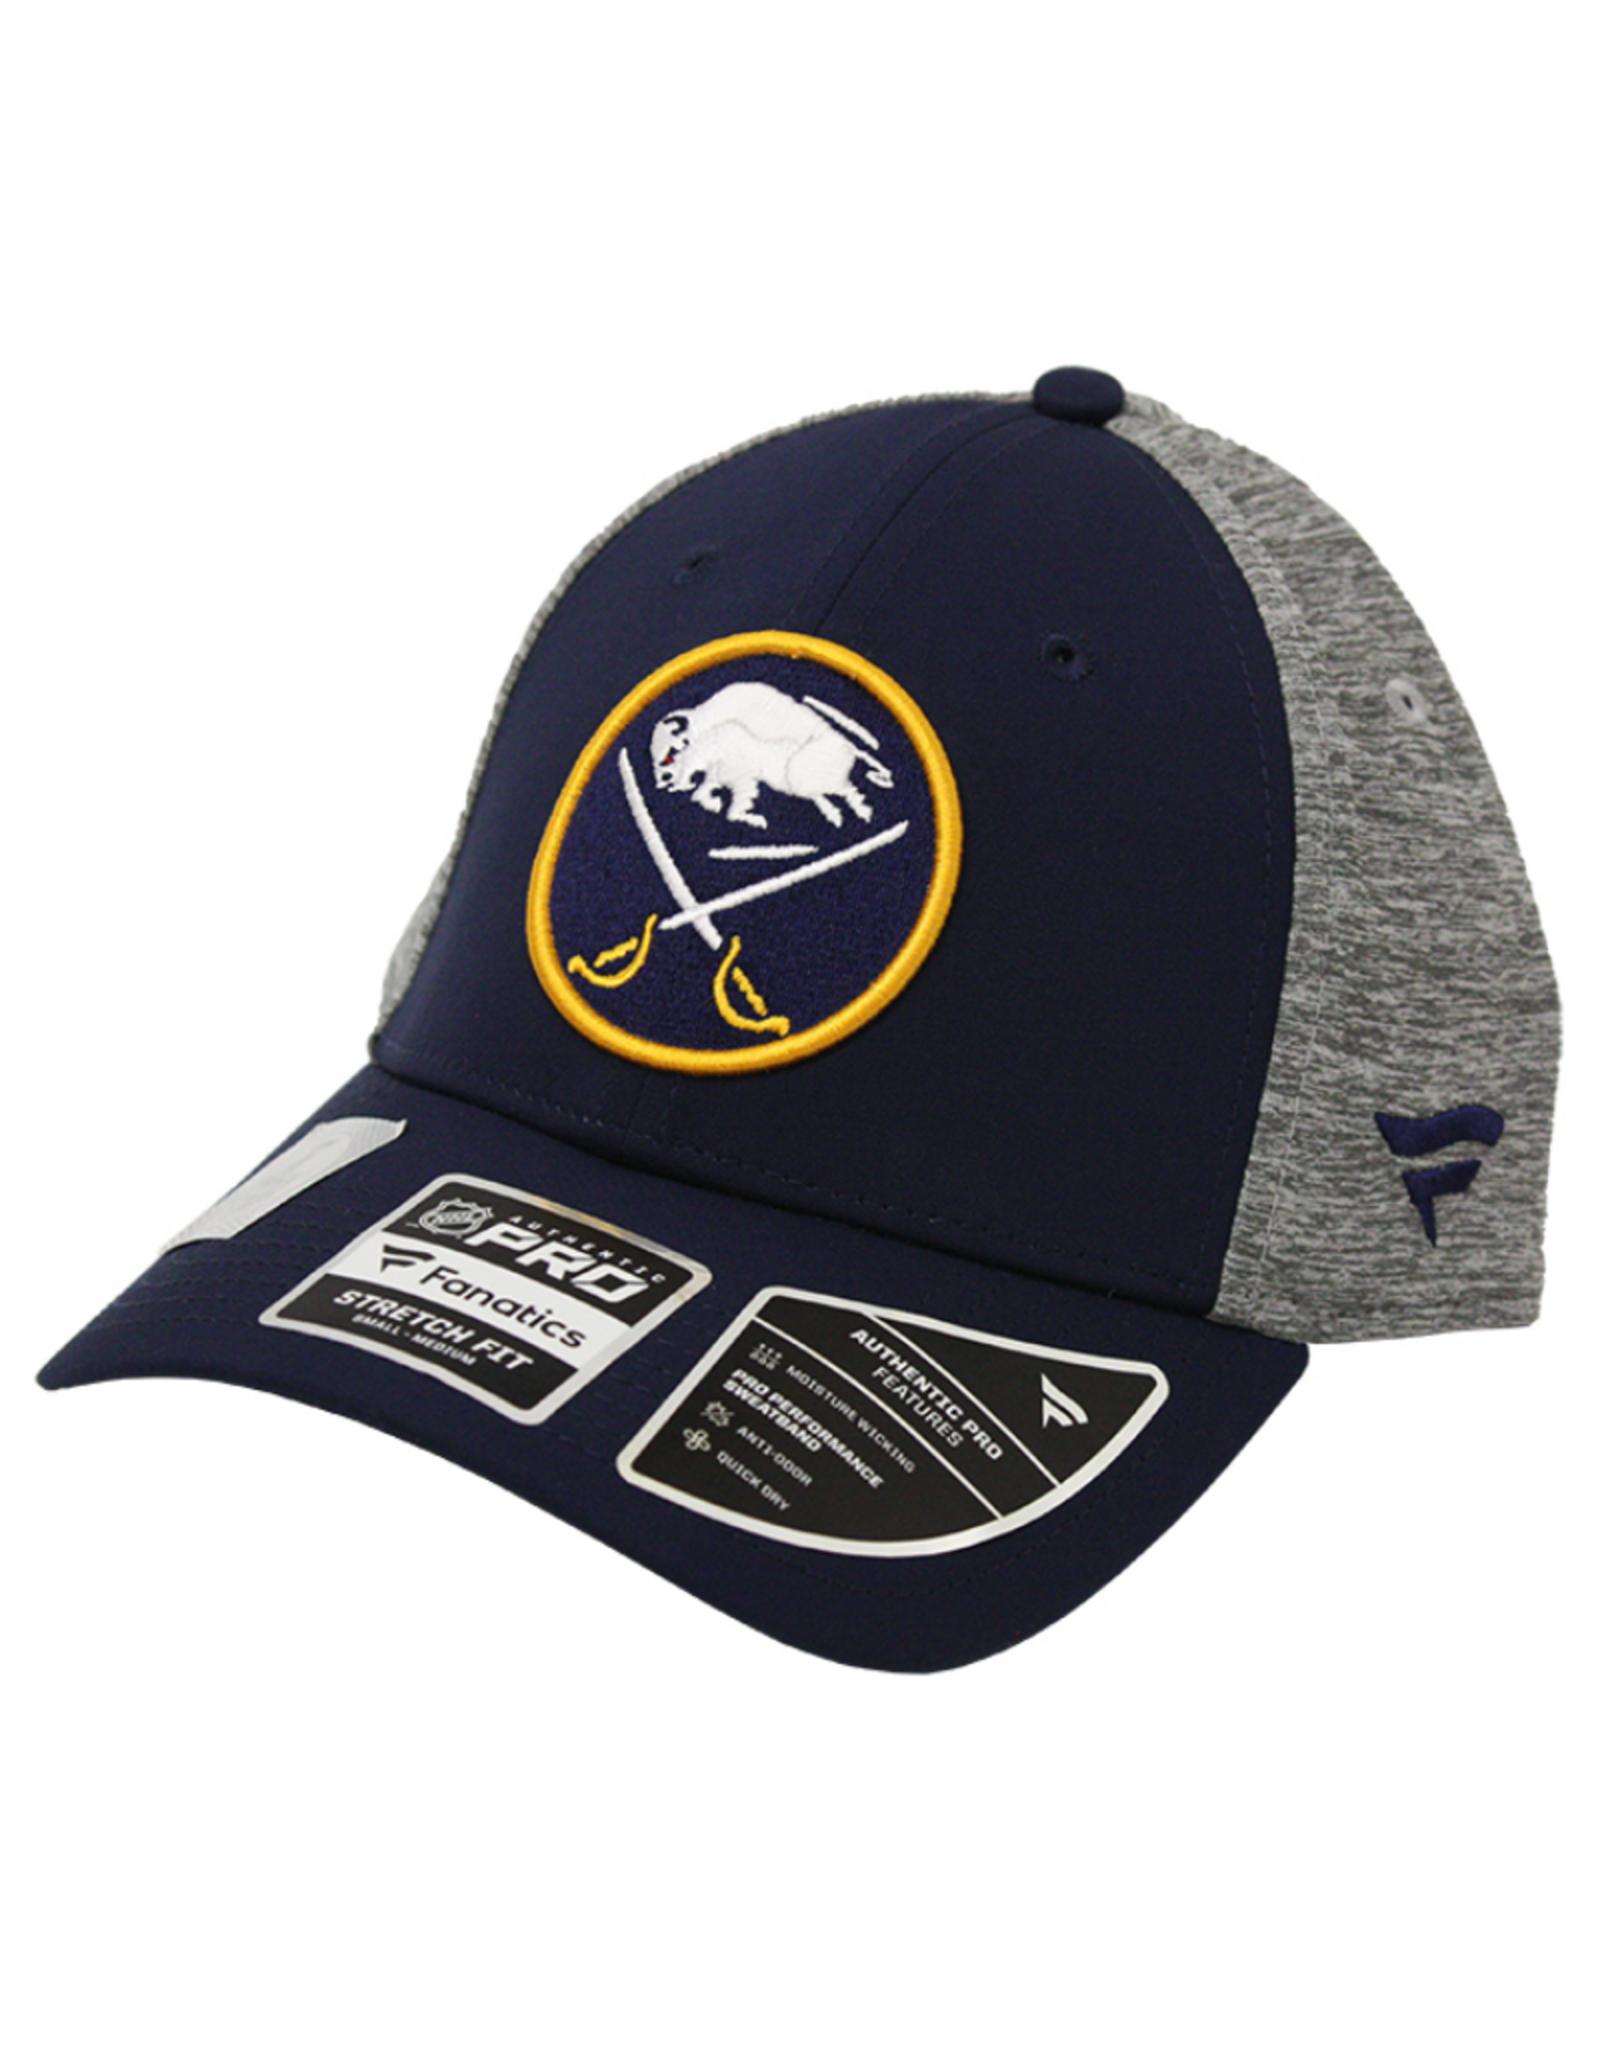 Fanatics Fanatics 2019 Player Participant Hat Buffalo Sabres Navy